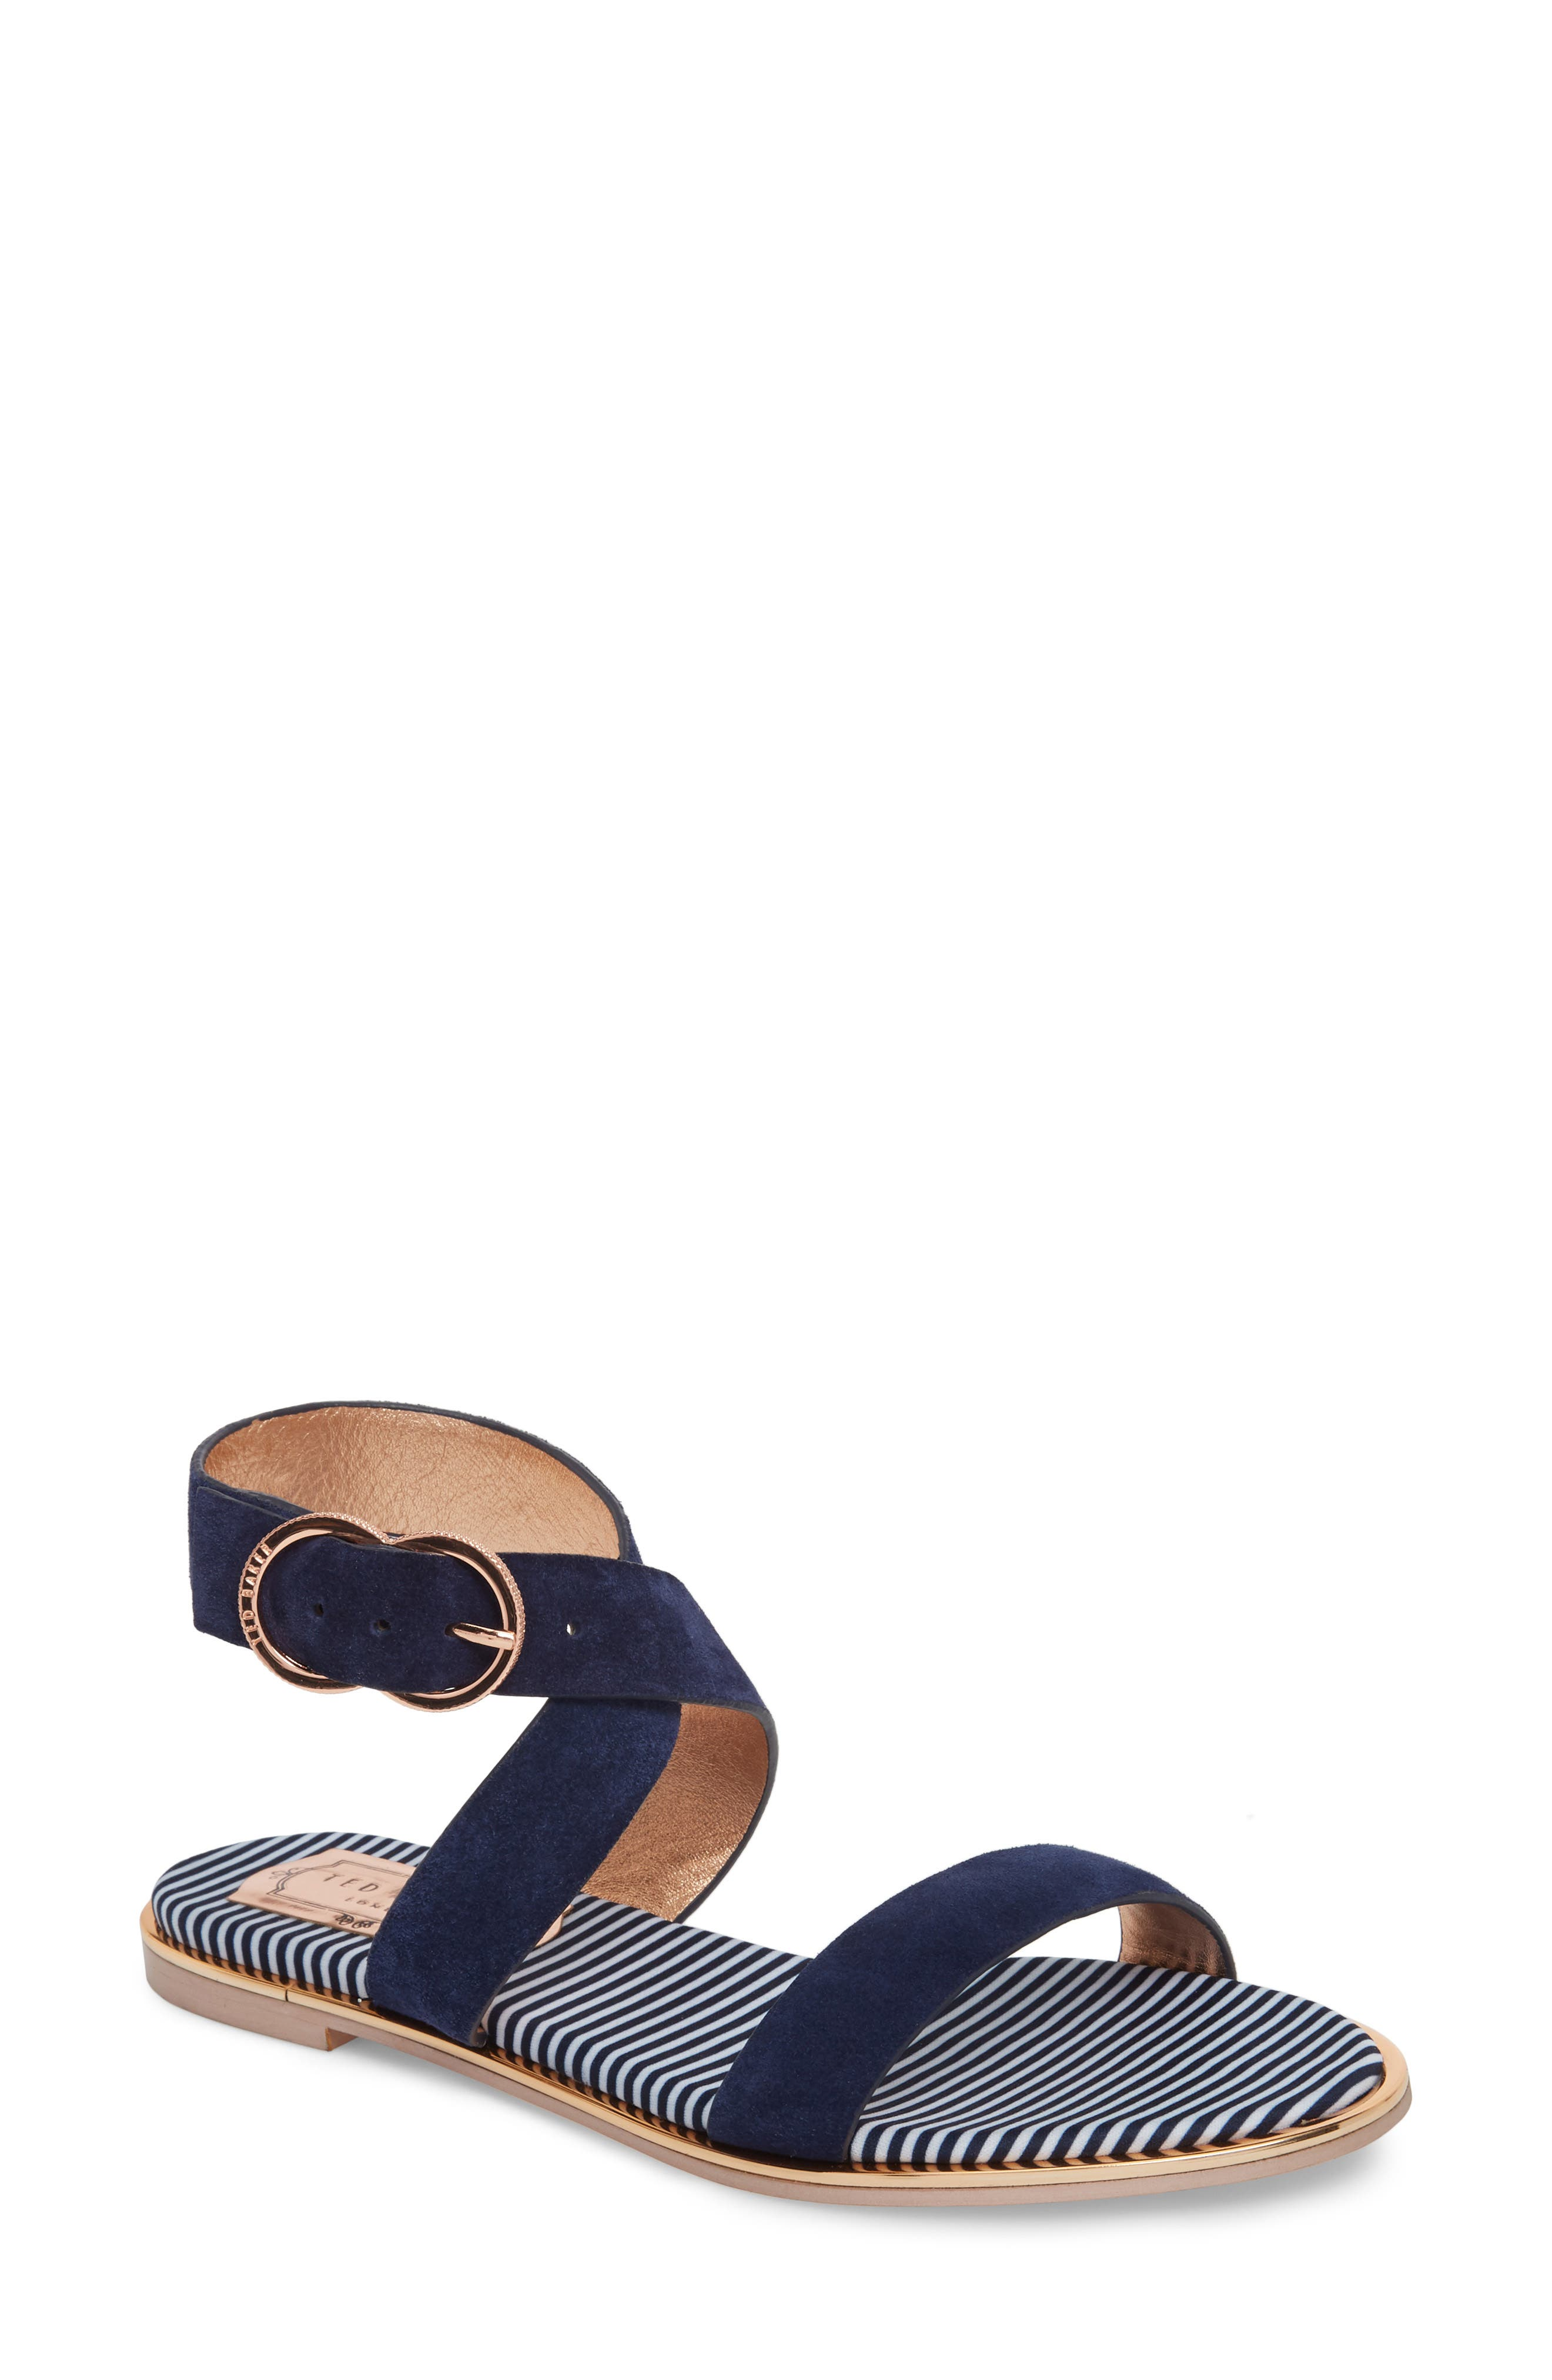 Qeredas Sandal,                         Main,                         color, 417